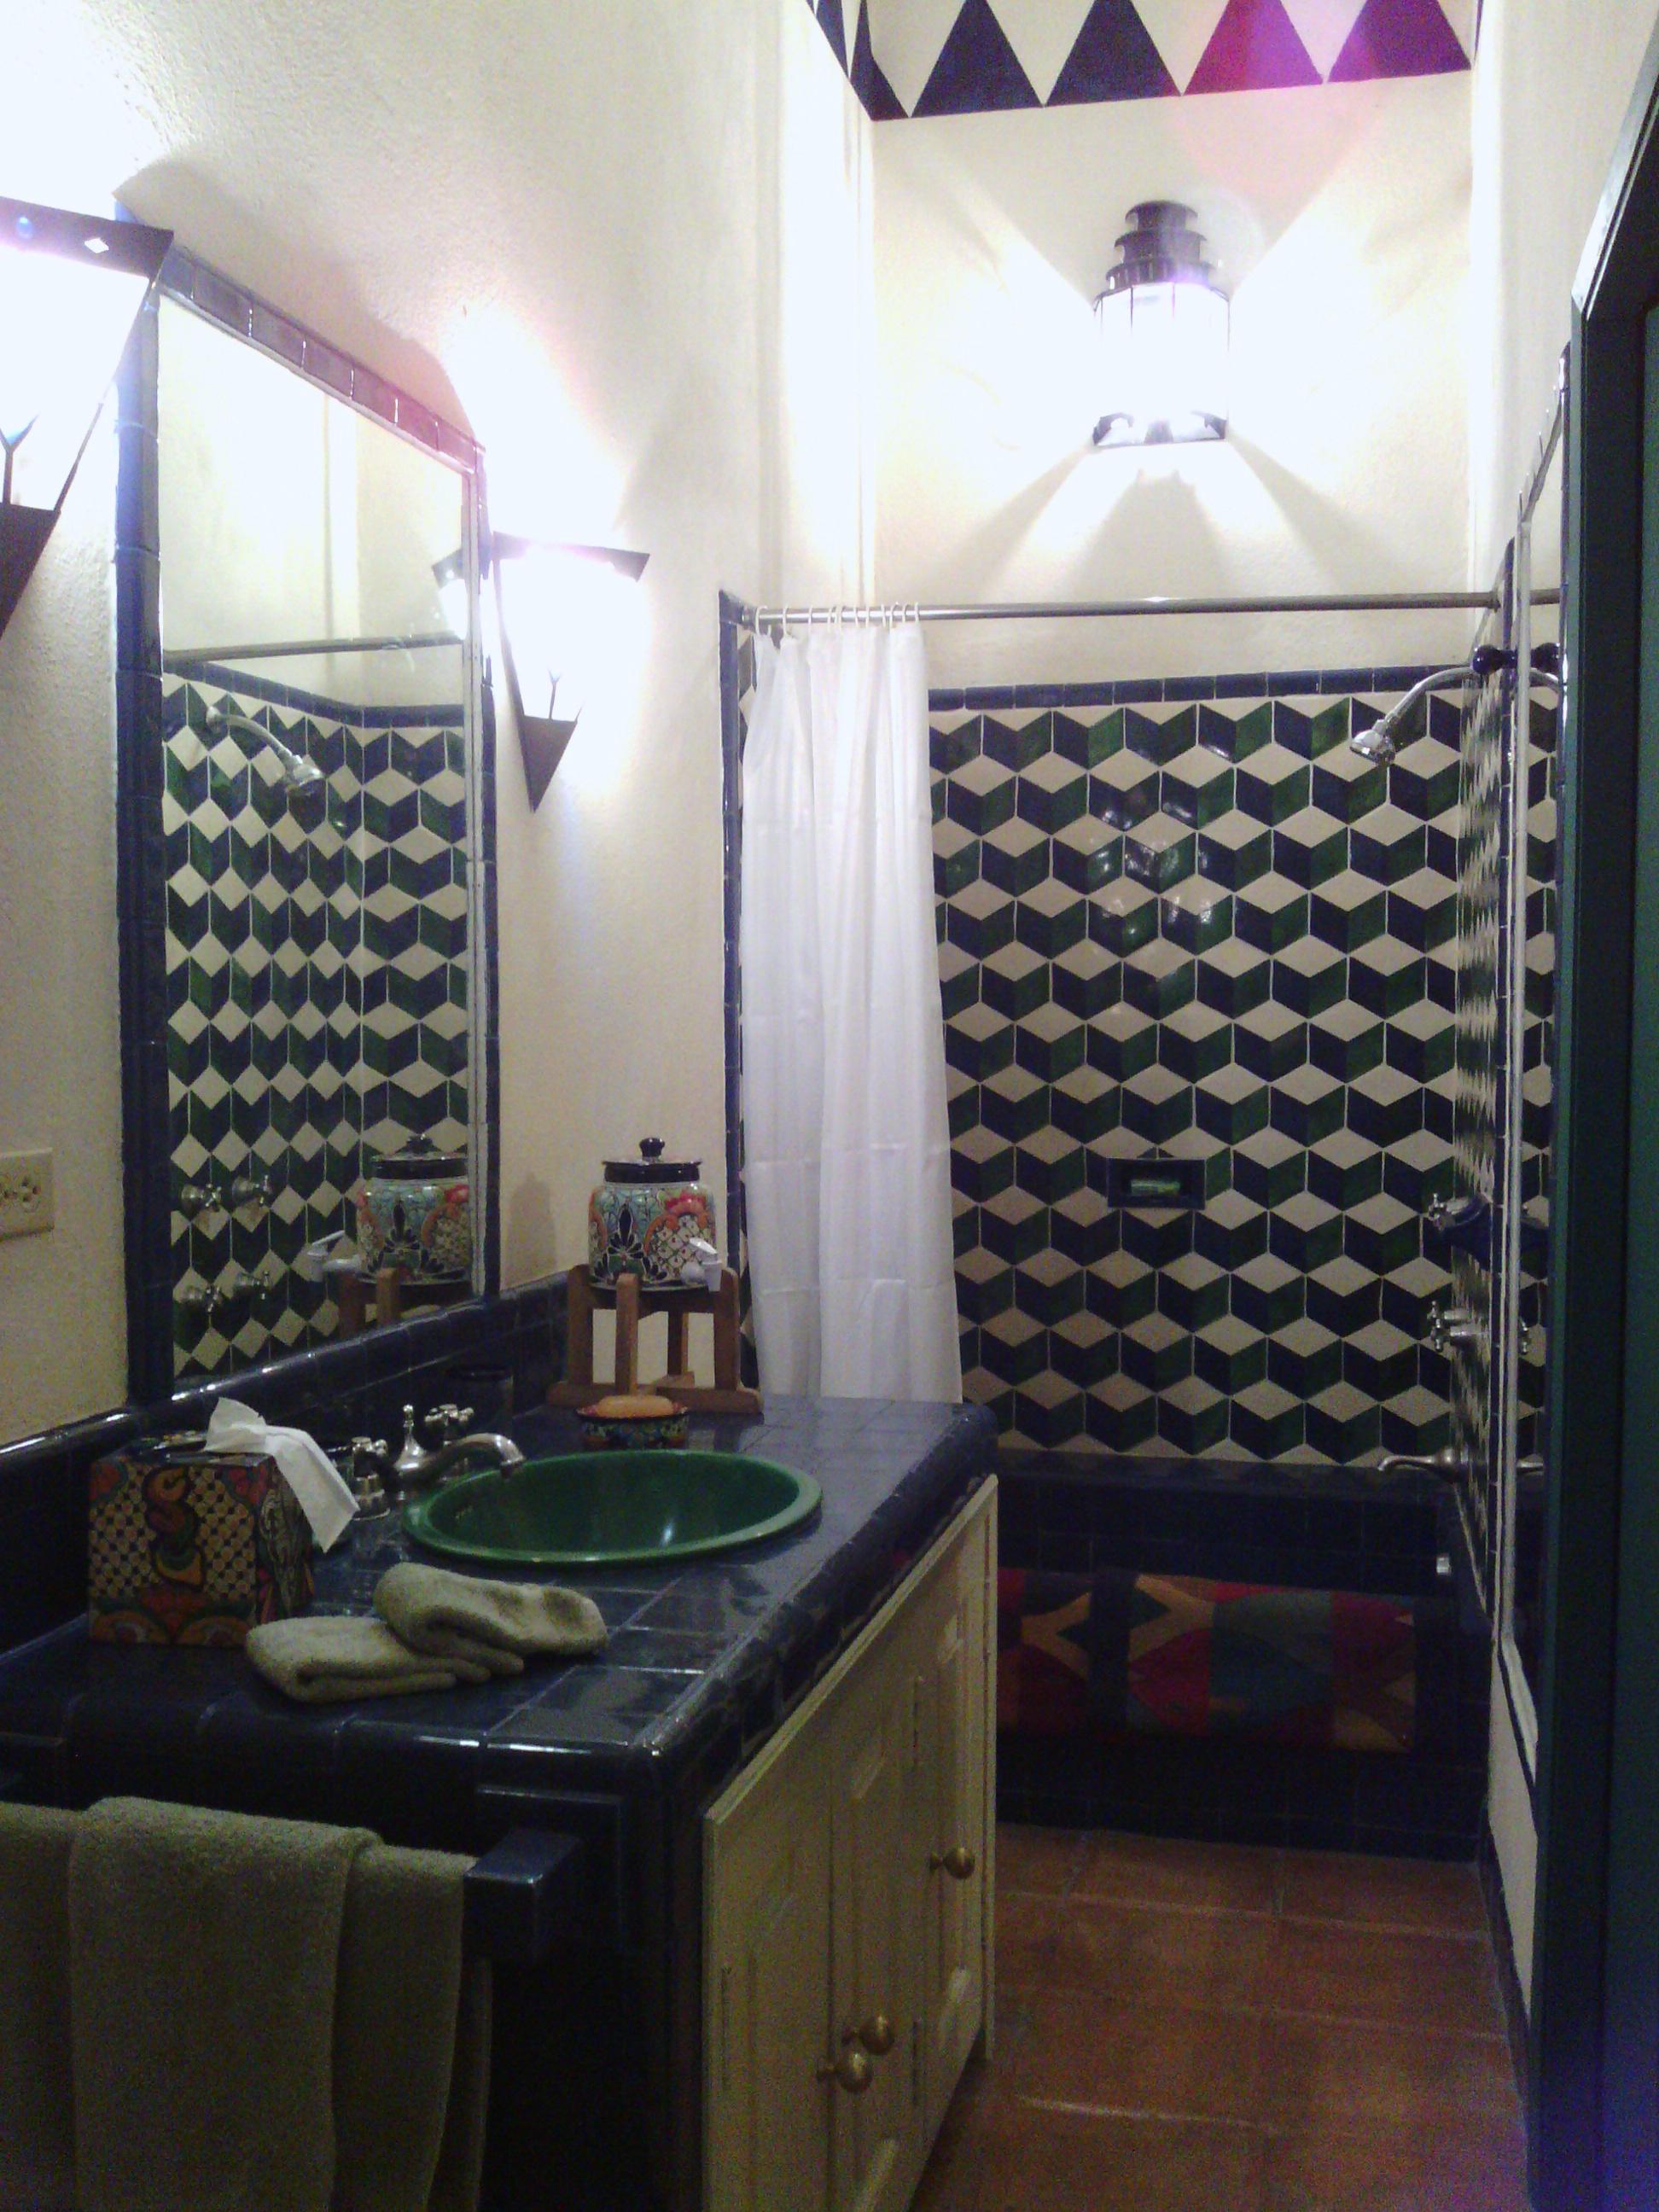 CasaEstrellaGrande_12 guest bath